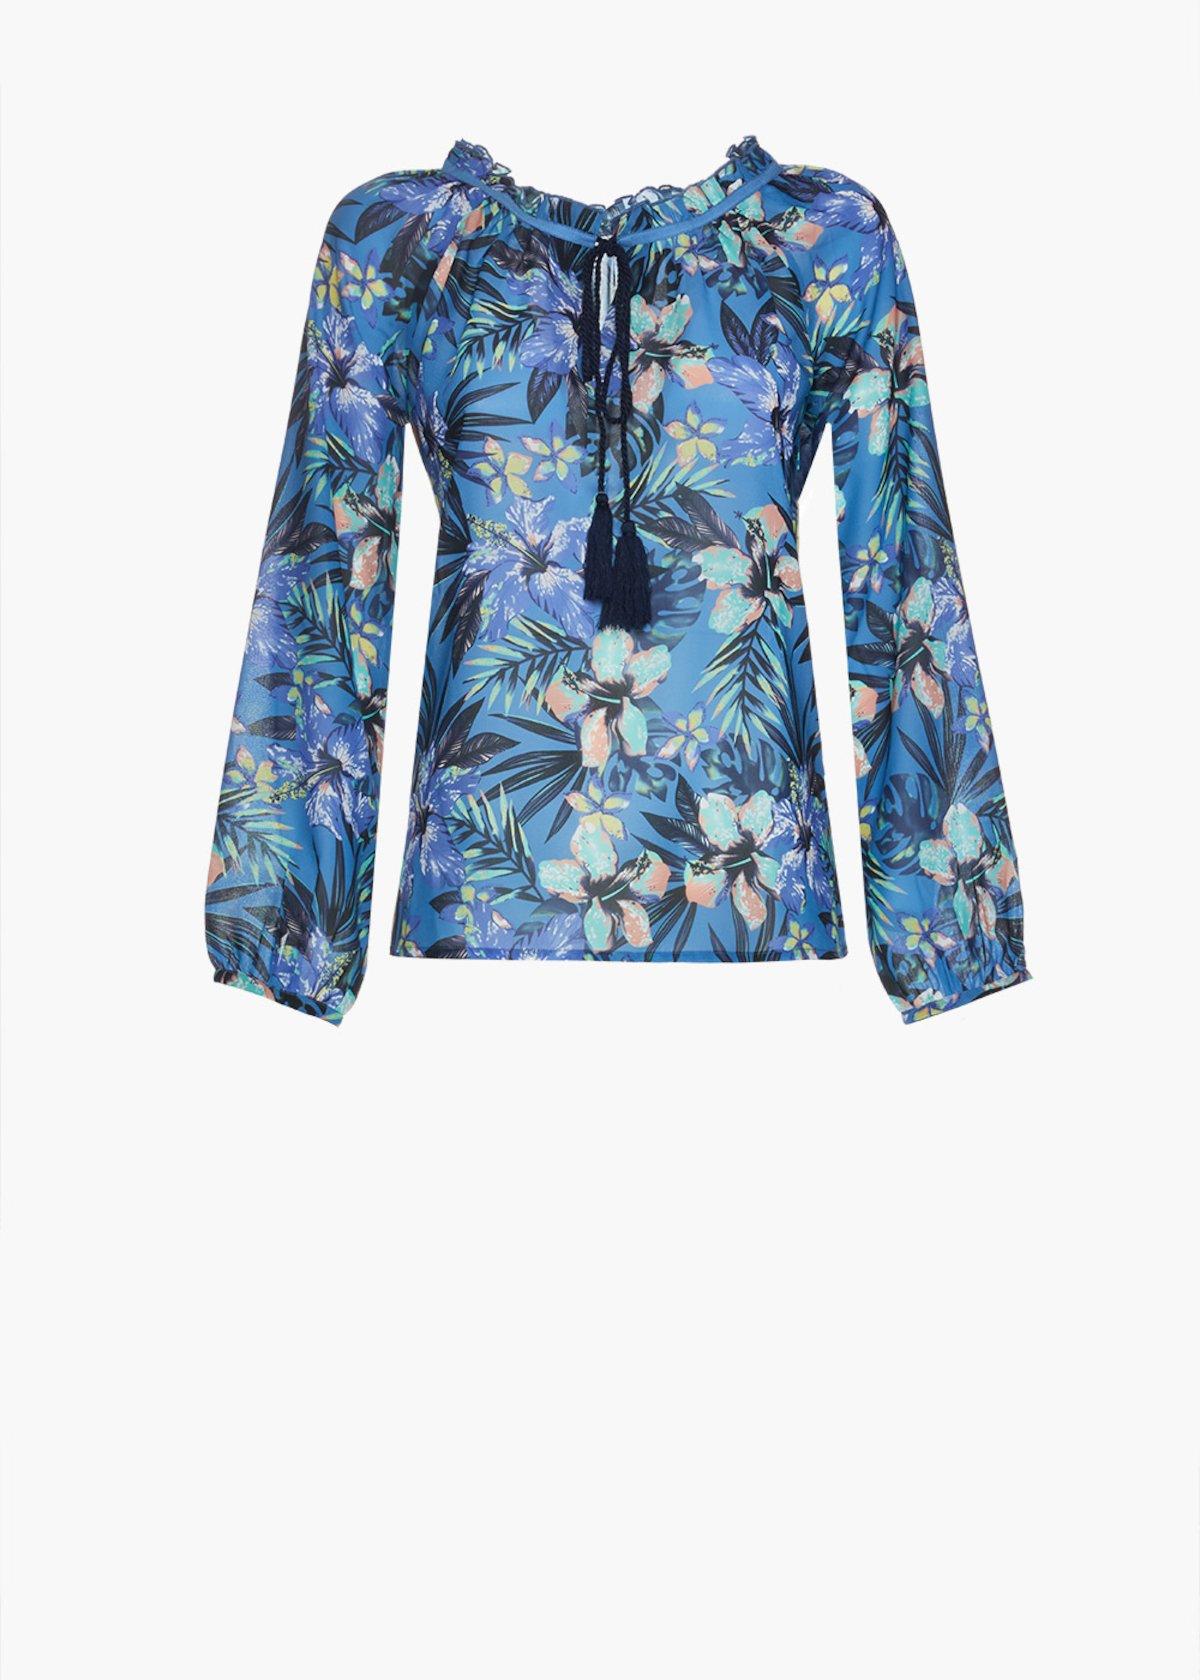 Cleof blouse in georgette flower print with round neckline